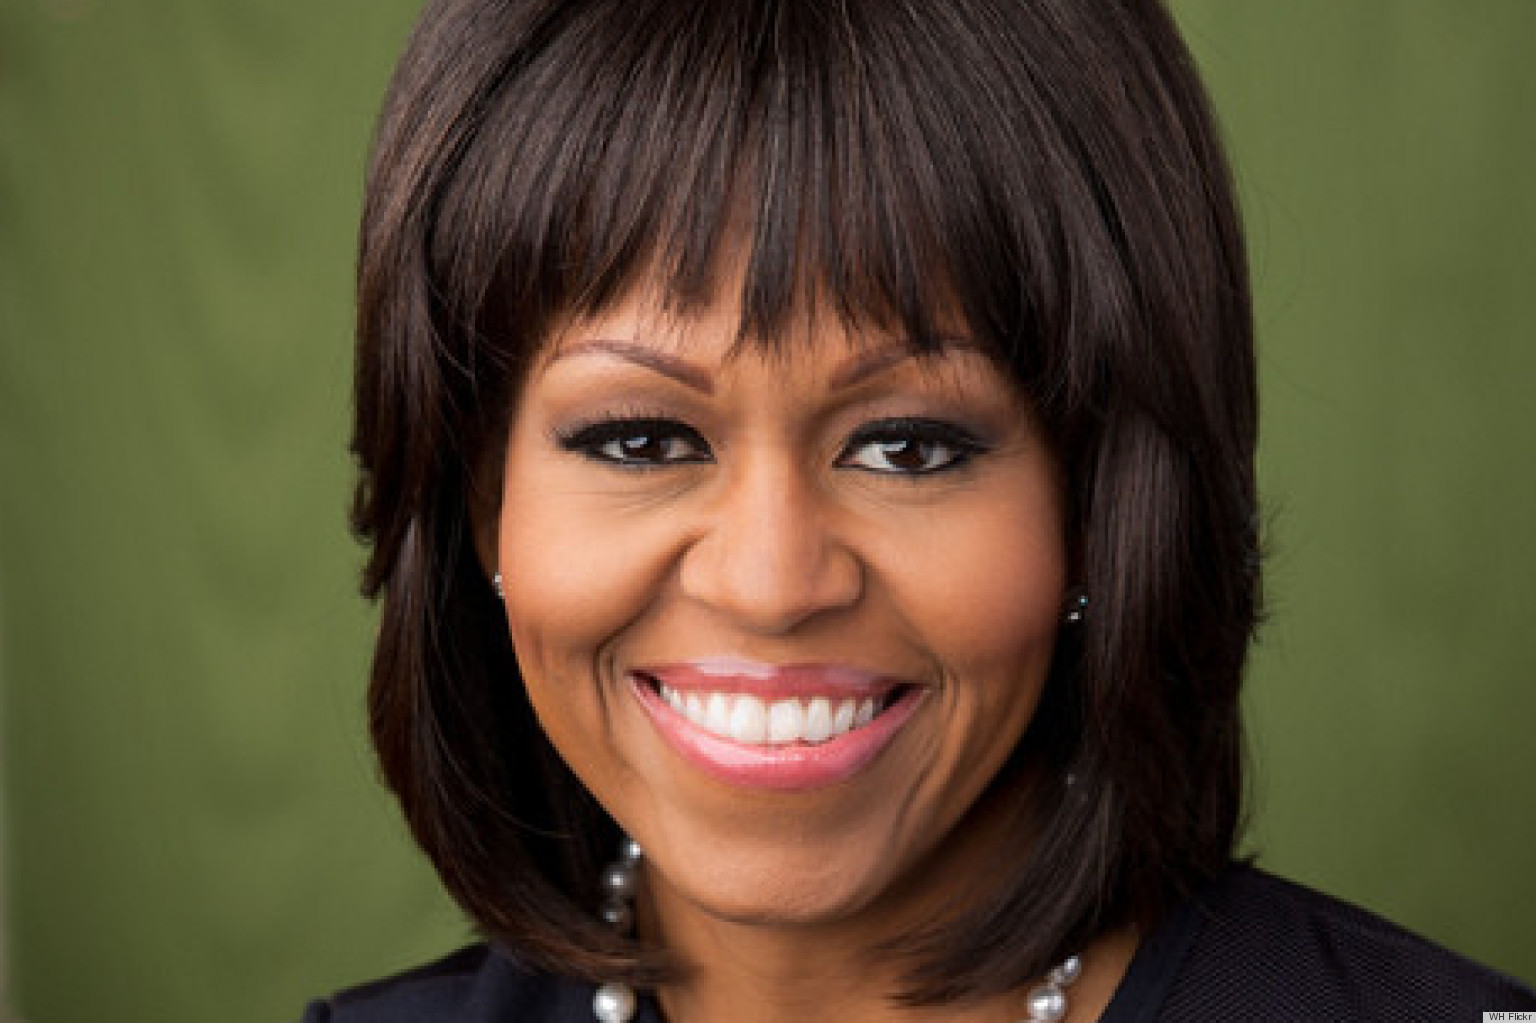 Michelle Obama S Portrait For 2013 Includes Bangs Photos